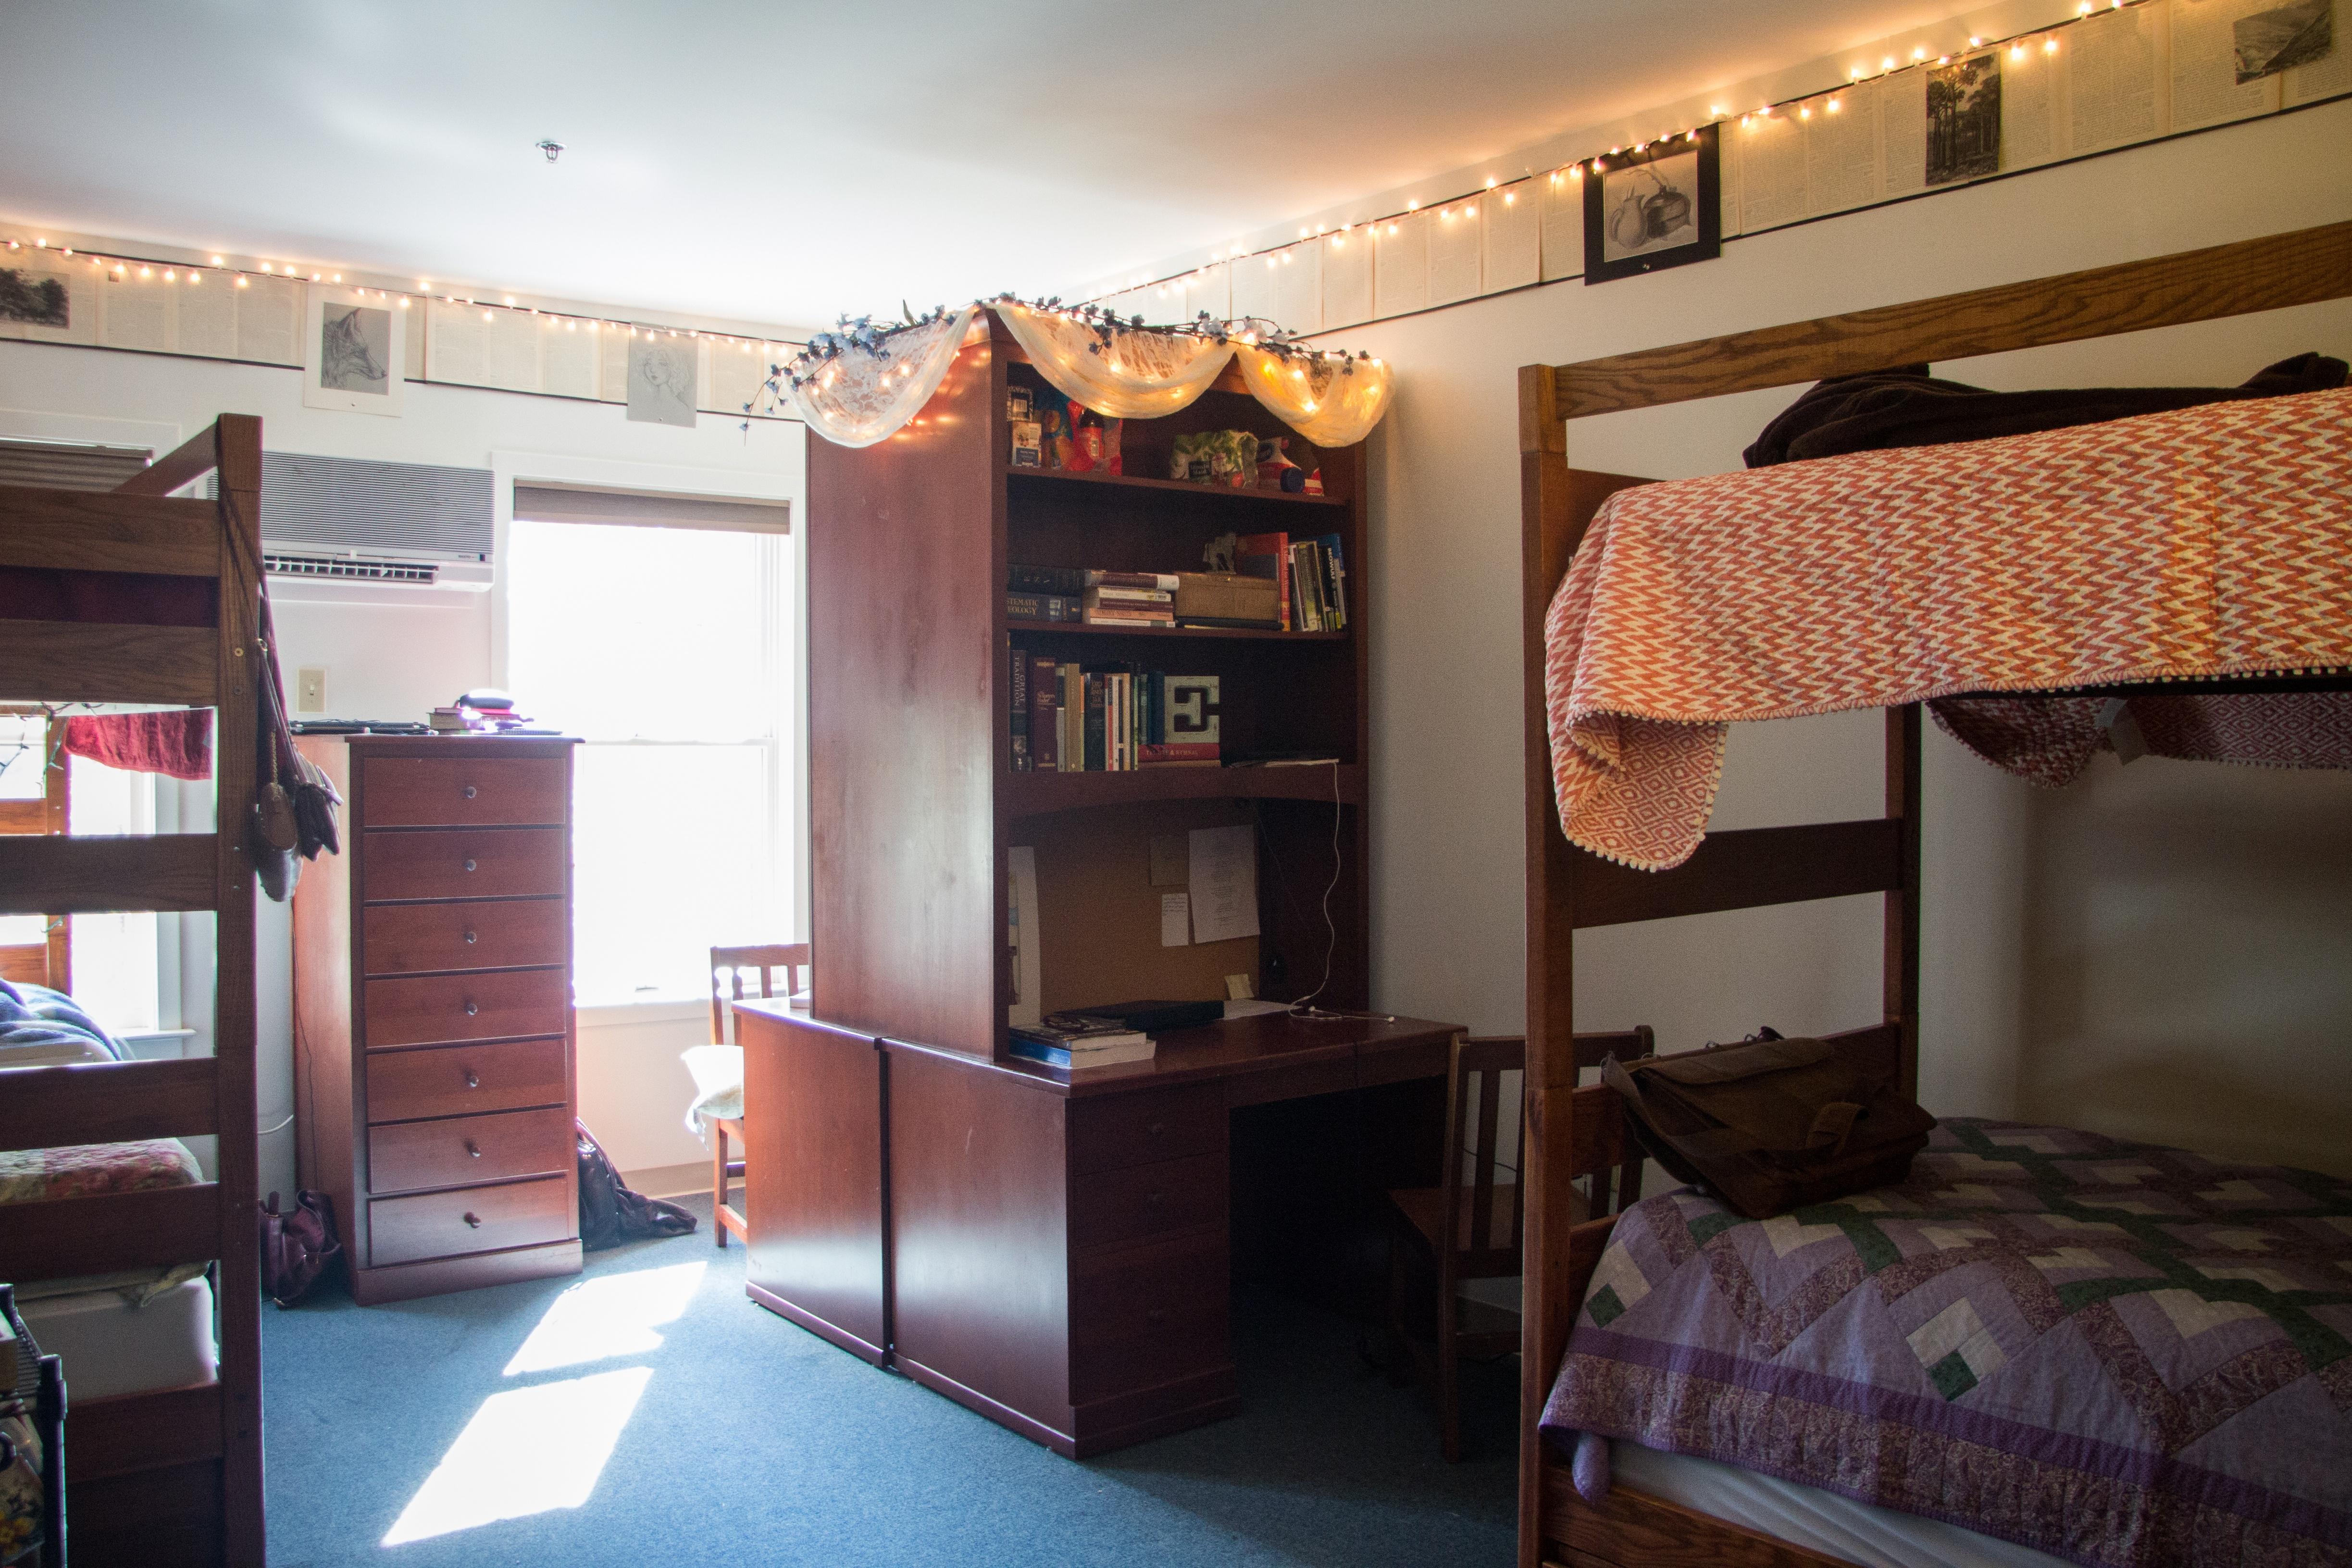 Patrick Henry College dorm room